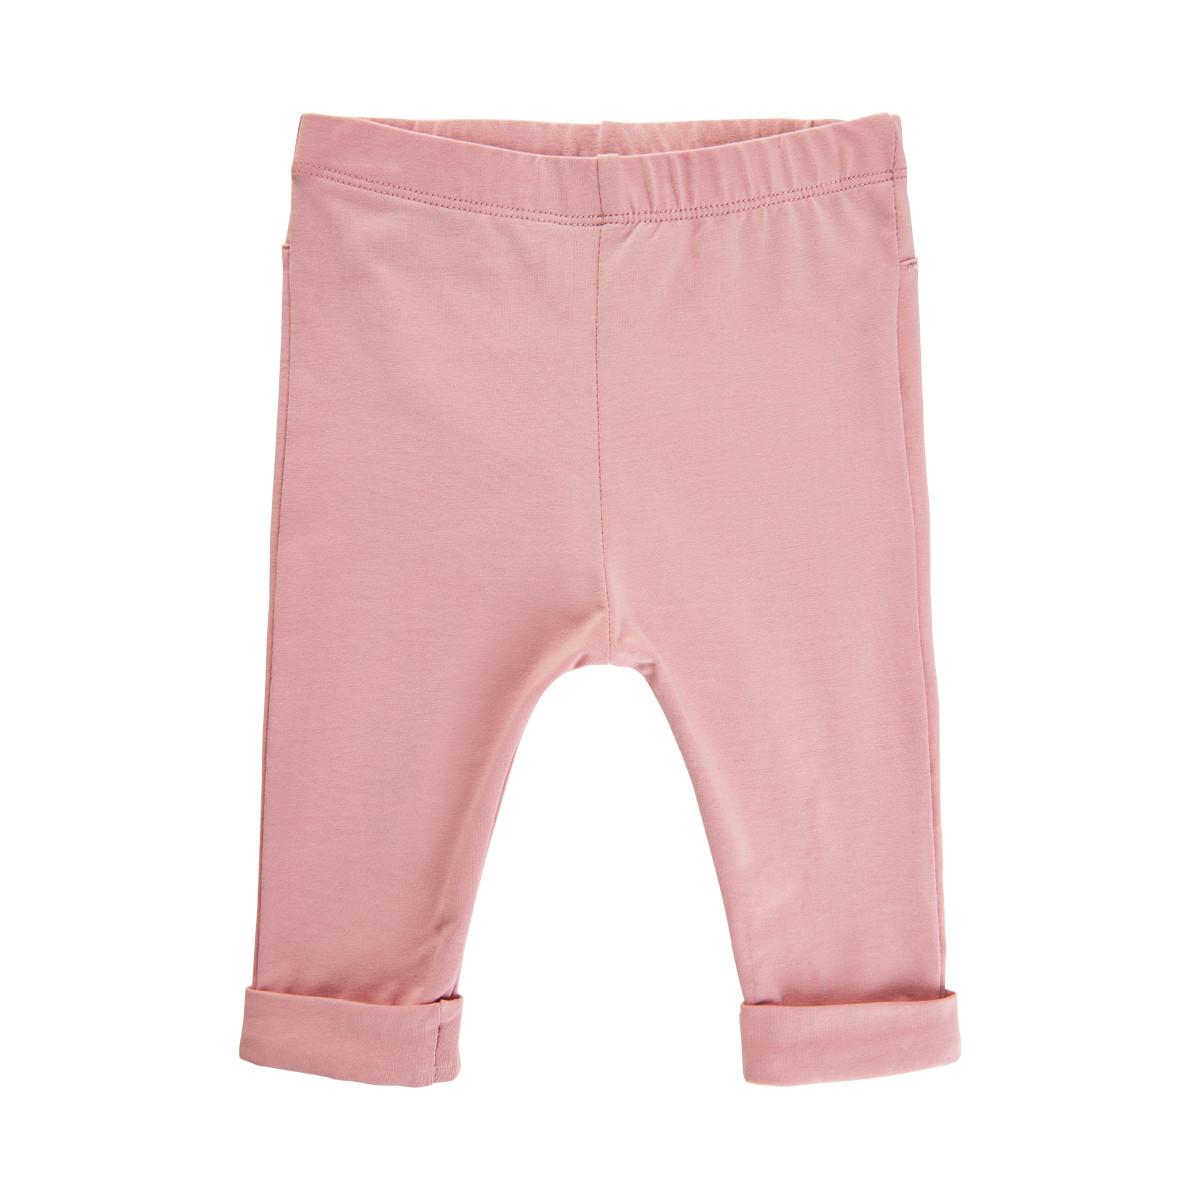 Minymo   Pants Print   N-18m   111172-5906